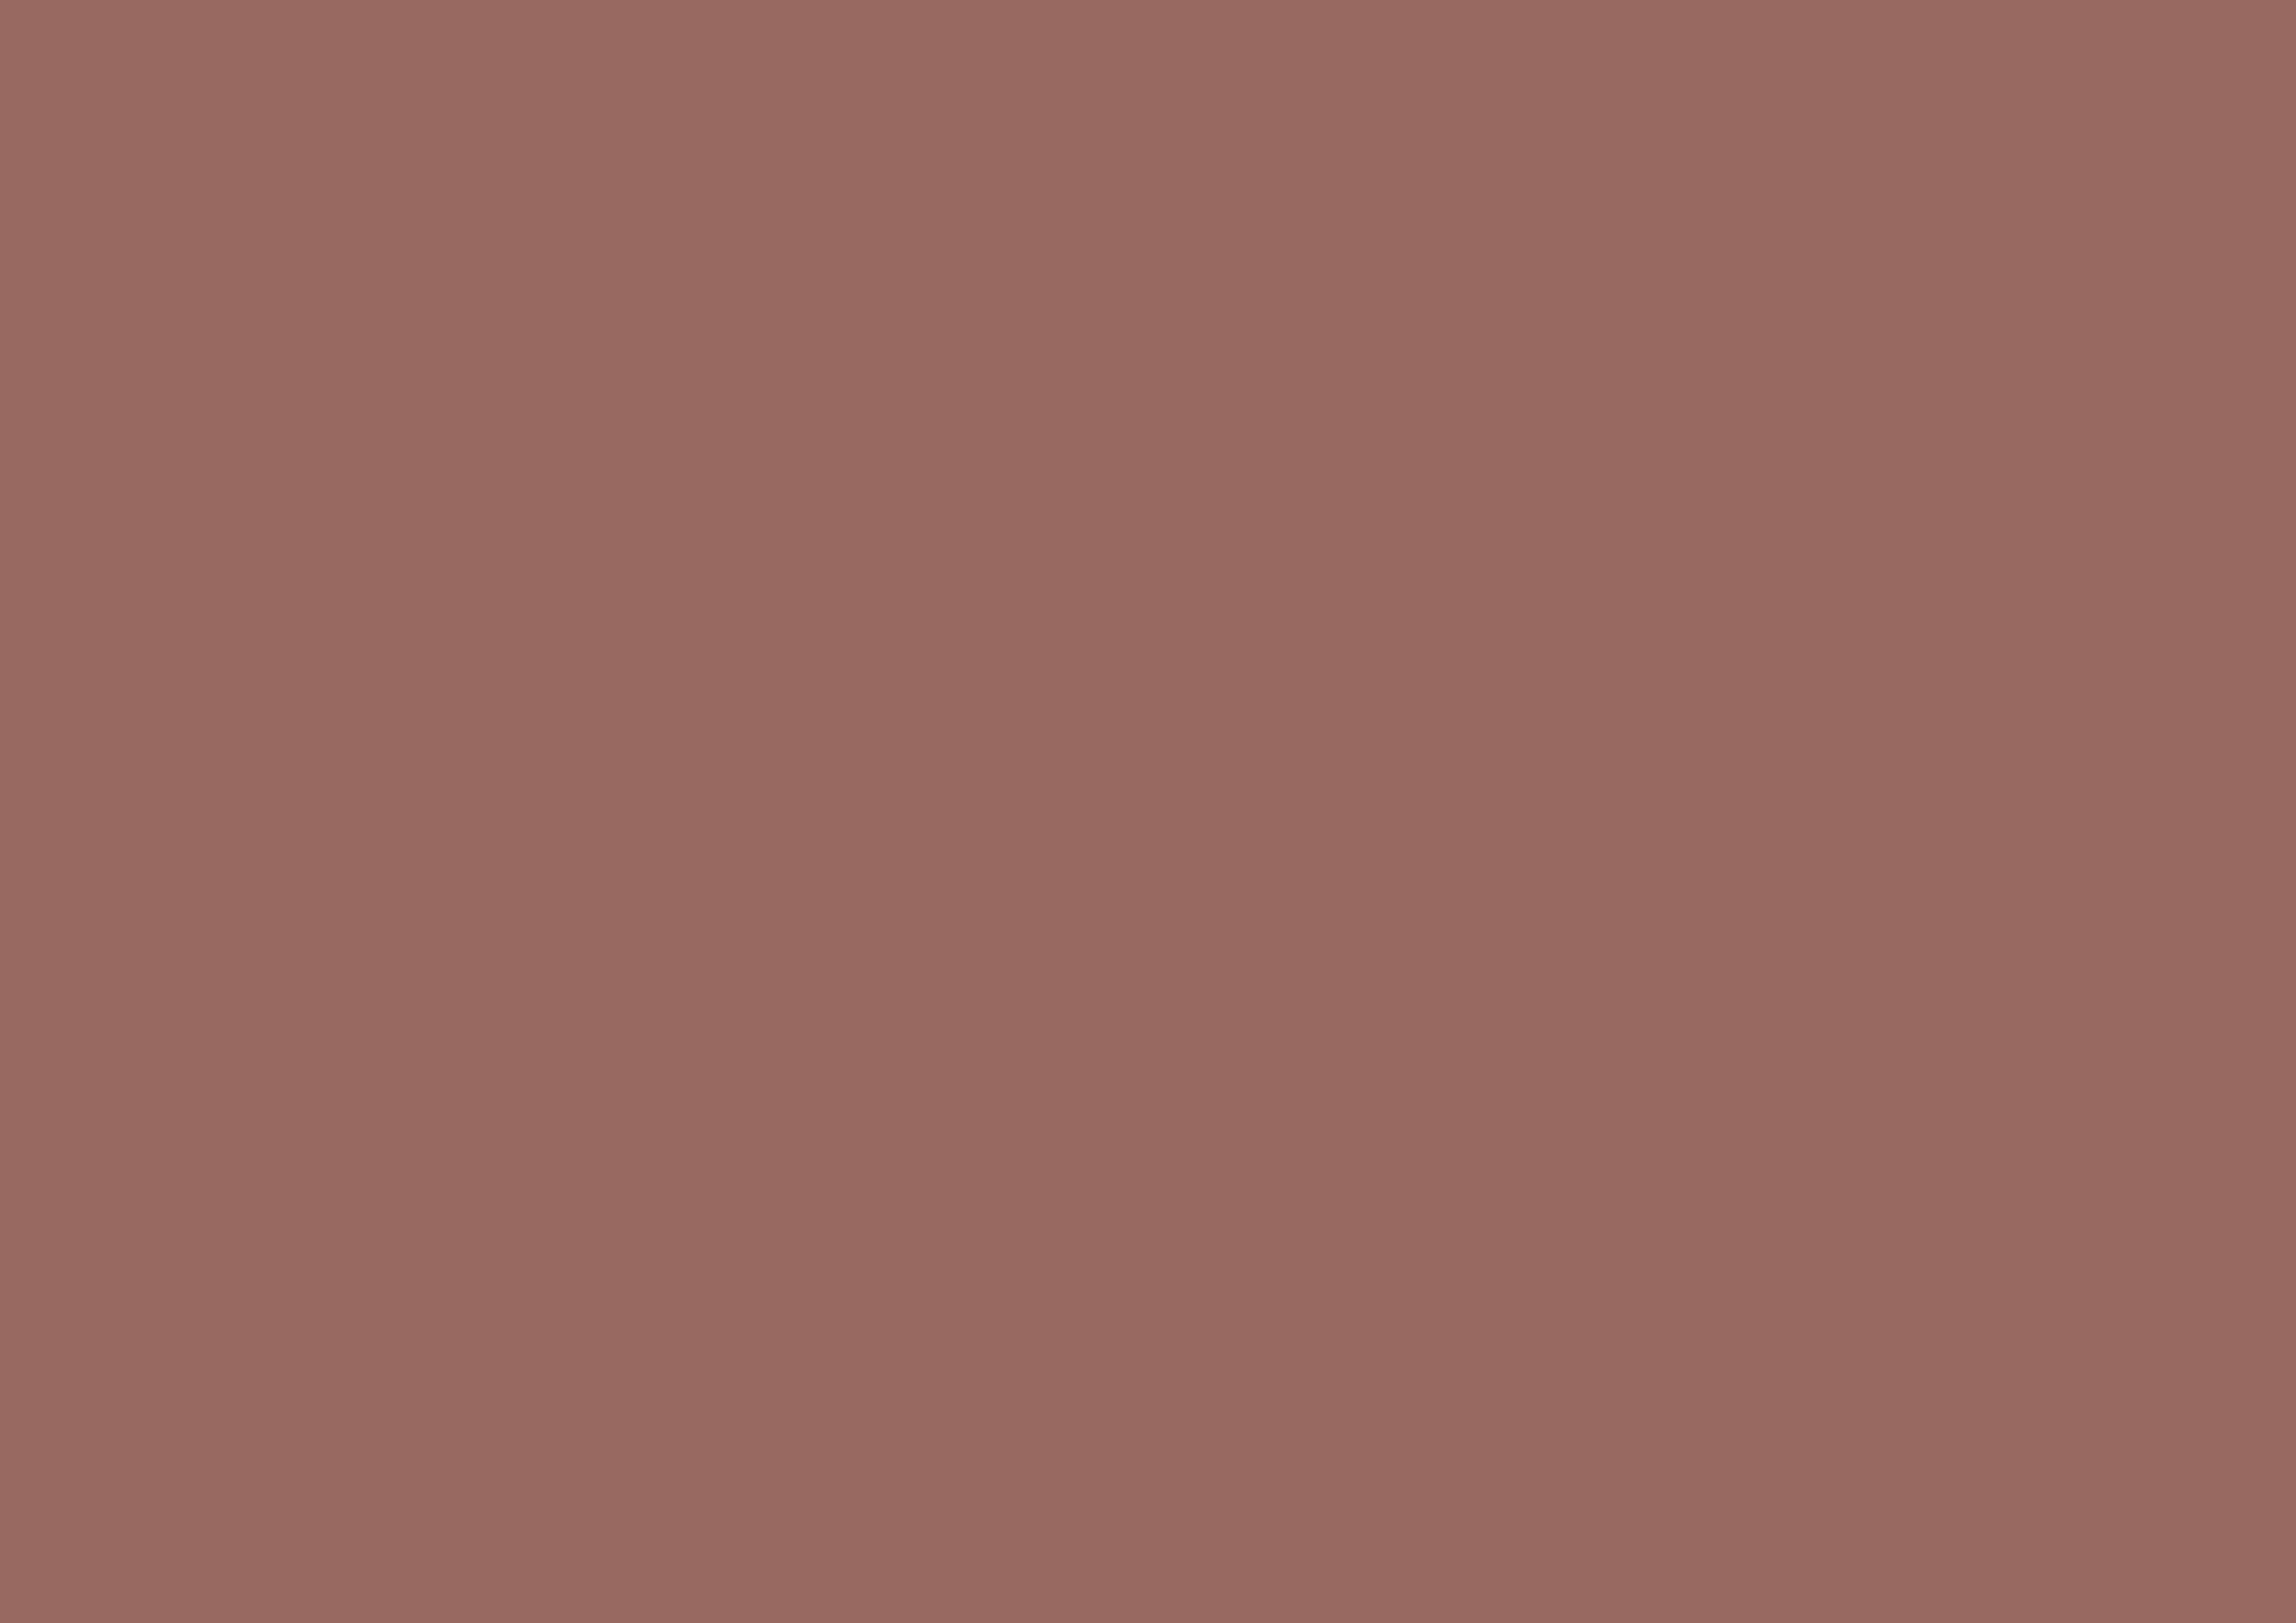 3508x2480 Dark Chestnut Solid Color Background